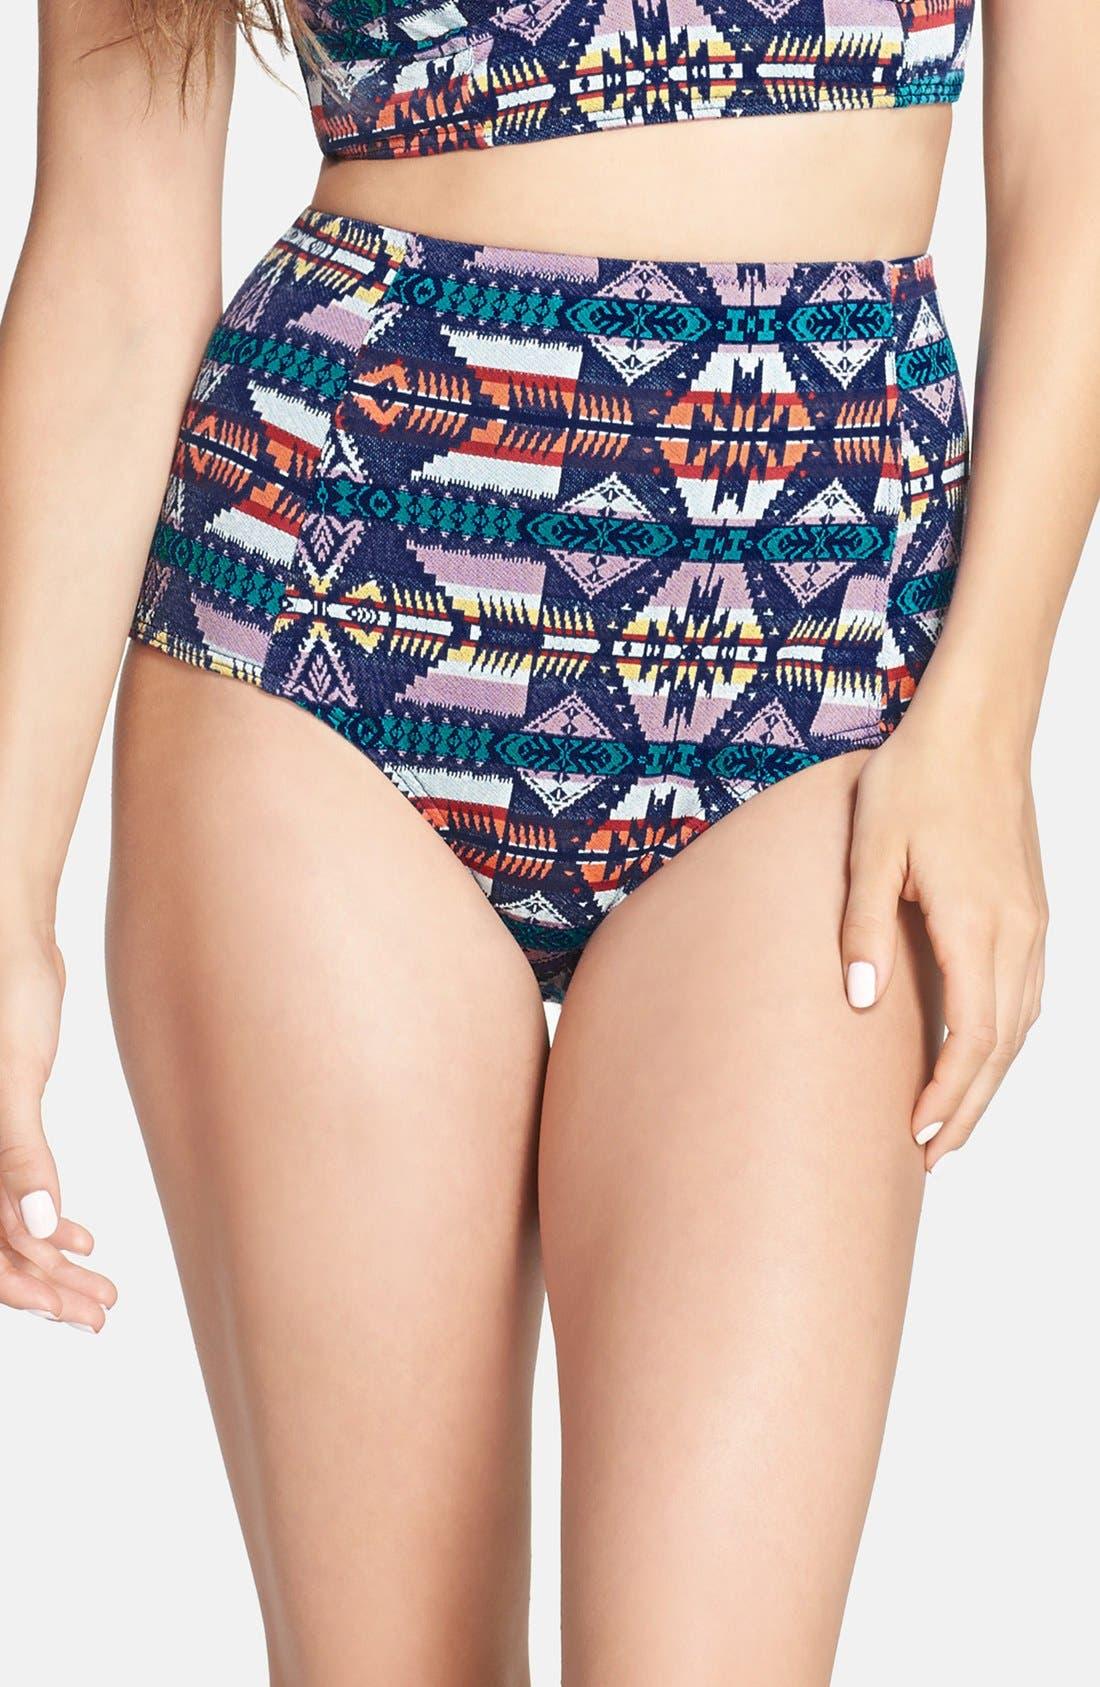 Main Image - Roxy X Pendleton 'Hot Tuesday' High Waist Bikini Bottoms